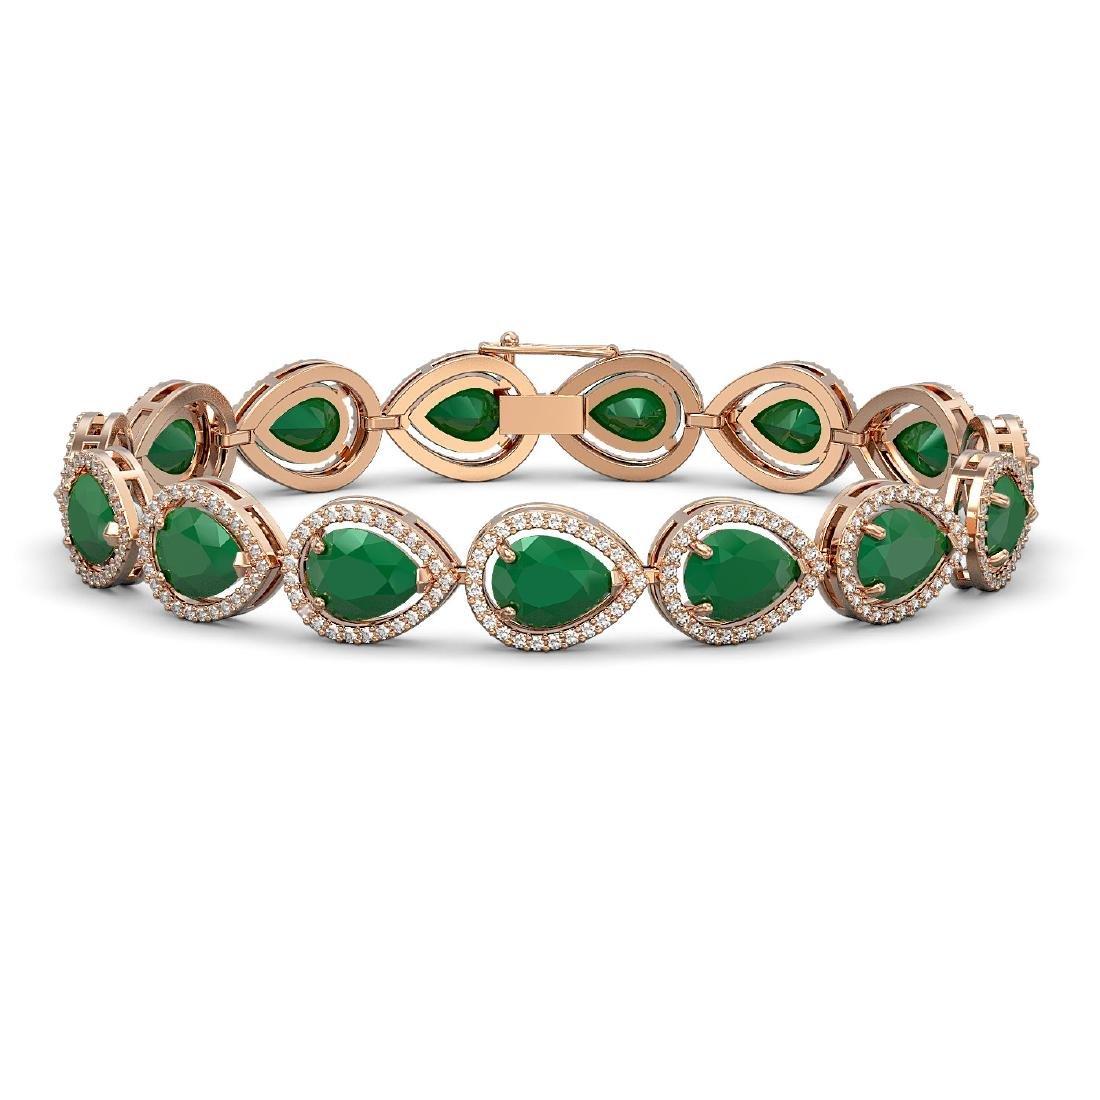 30.06 CTW Emerald & Diamond Halo Bracelet 10K Rose Gold